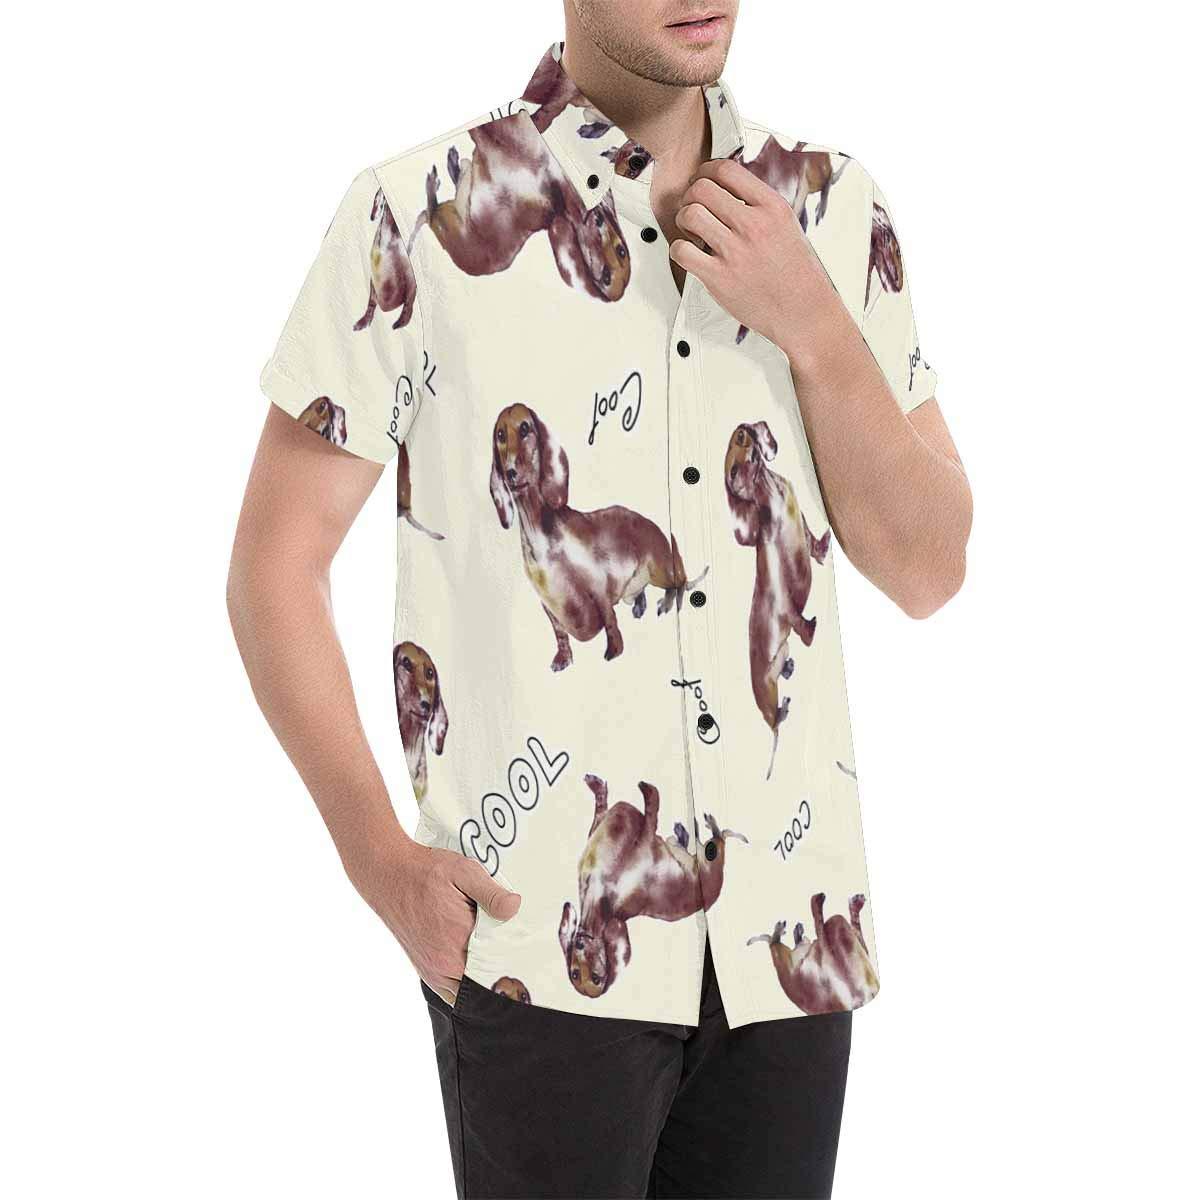 InterestPrint Button Down T Shirts Cool Dogs Button Down Shirts Short Sleeve